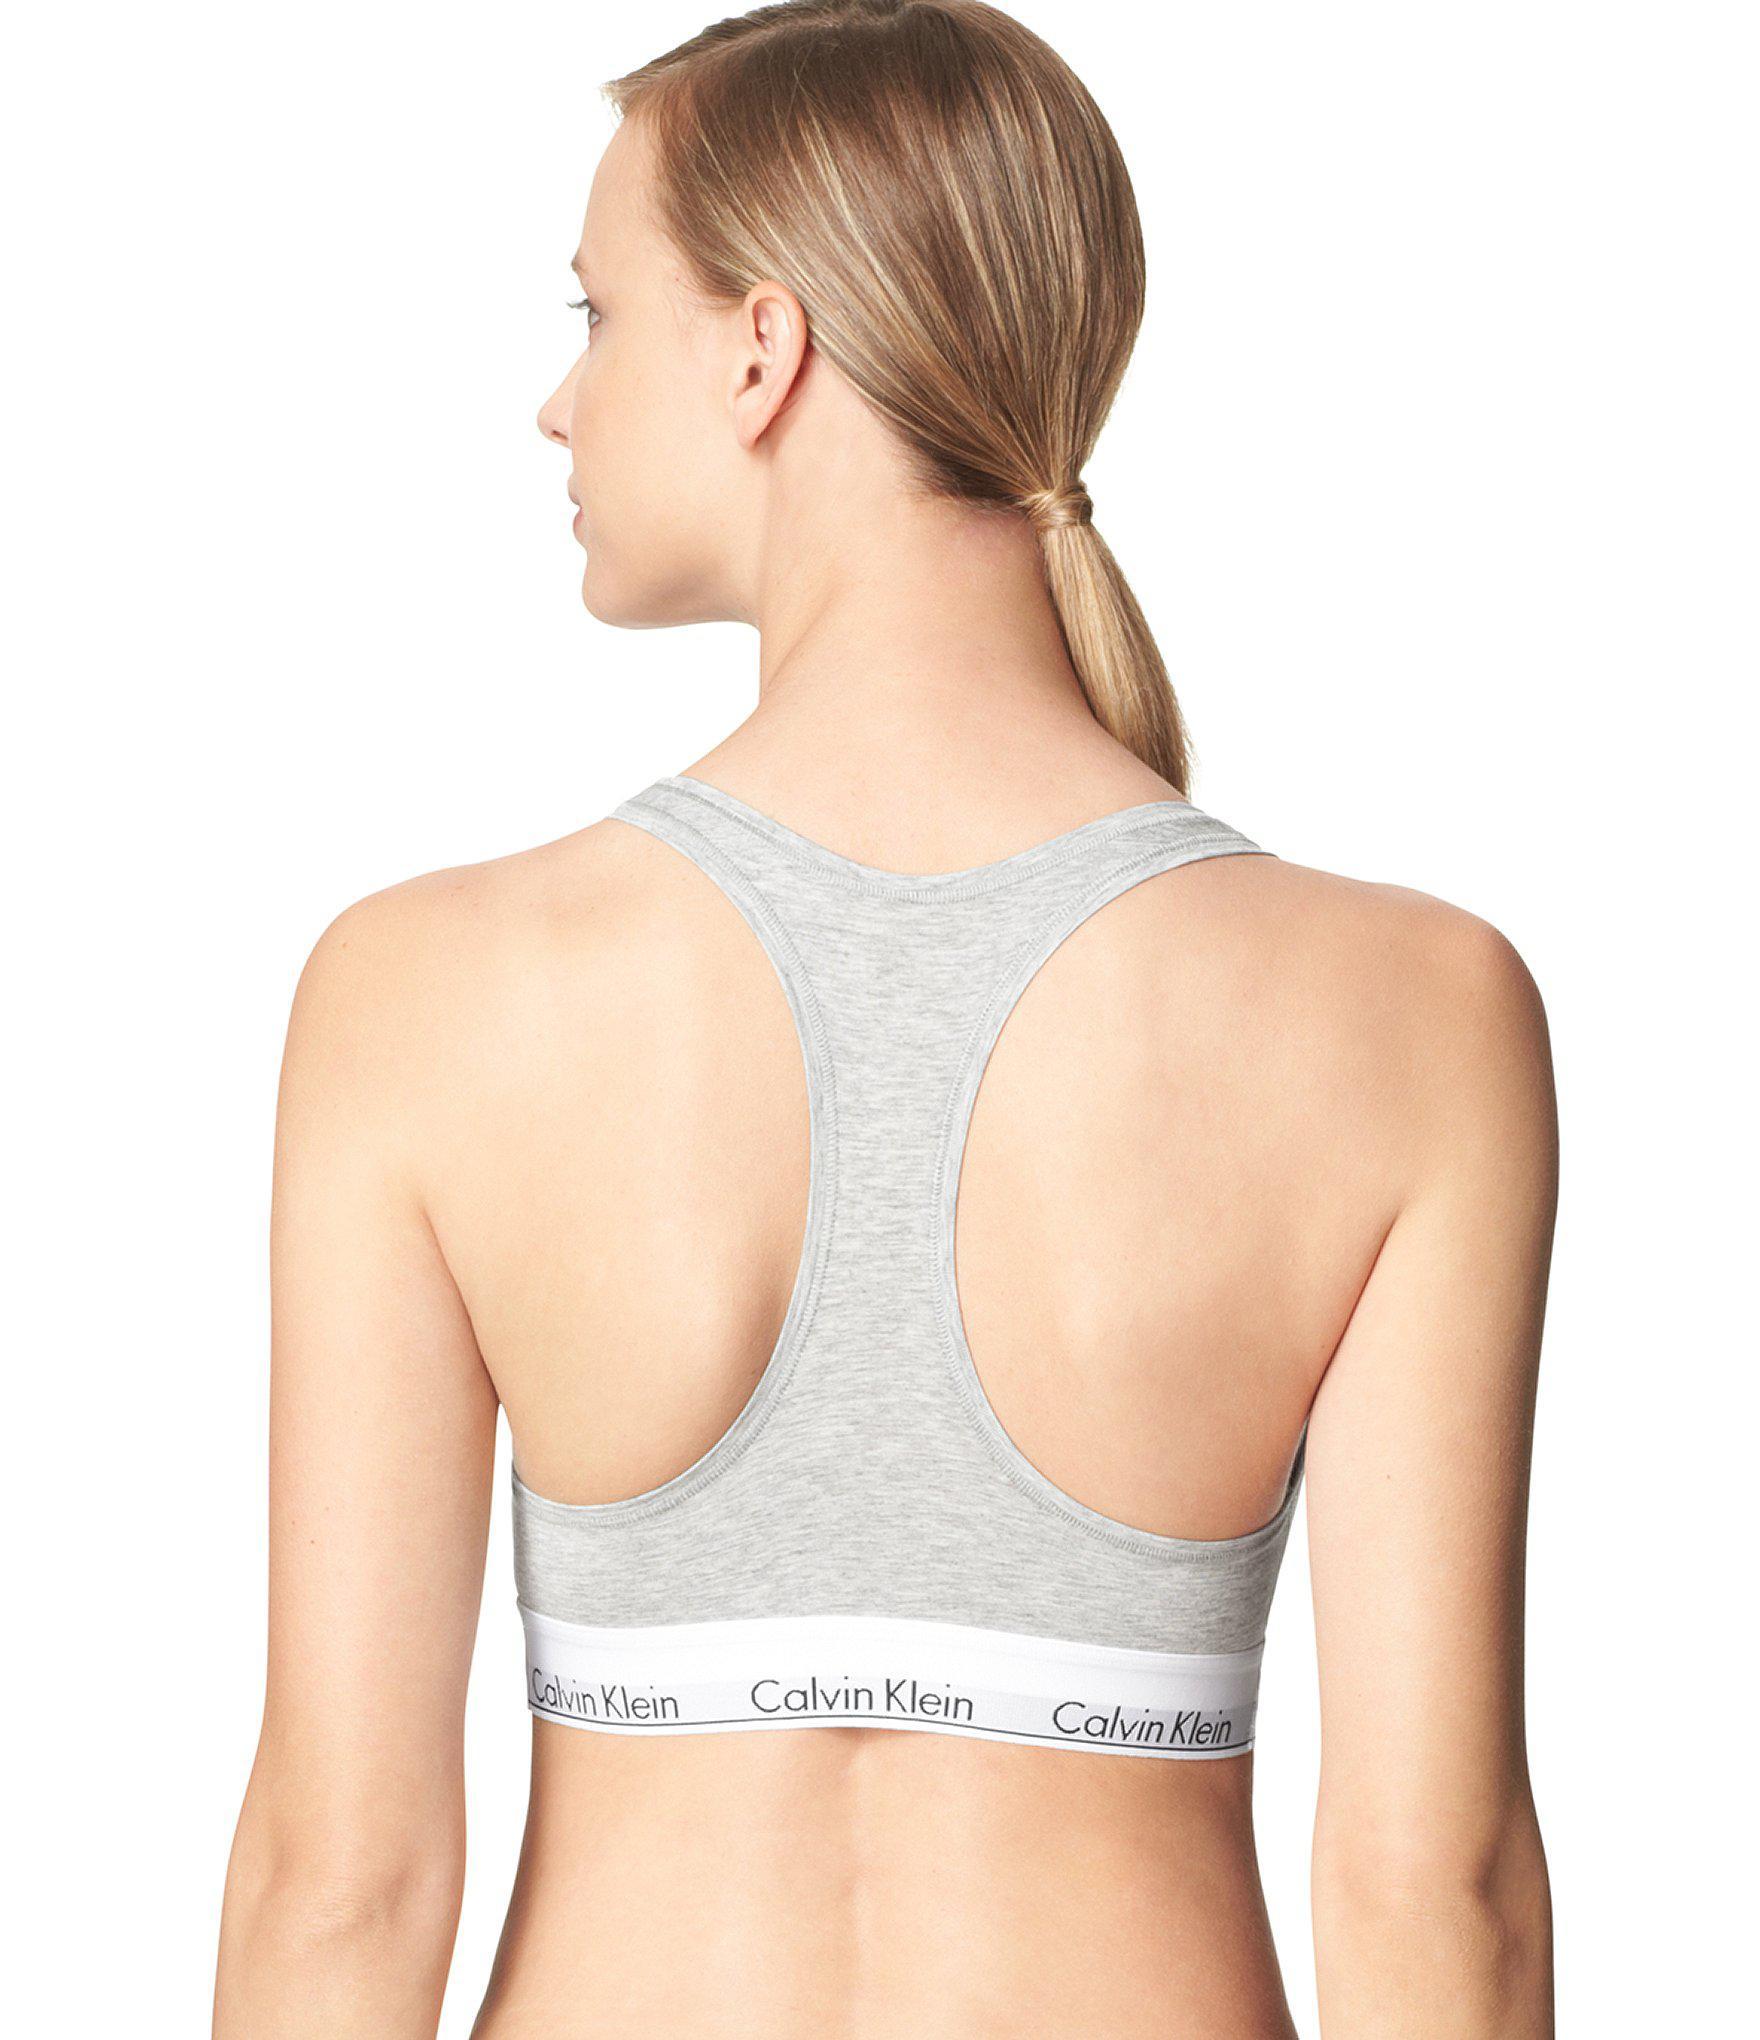 ce558979c14551 Lyst - Calvin Klein Modern Seamless Racerback Sports Bralette in Gray